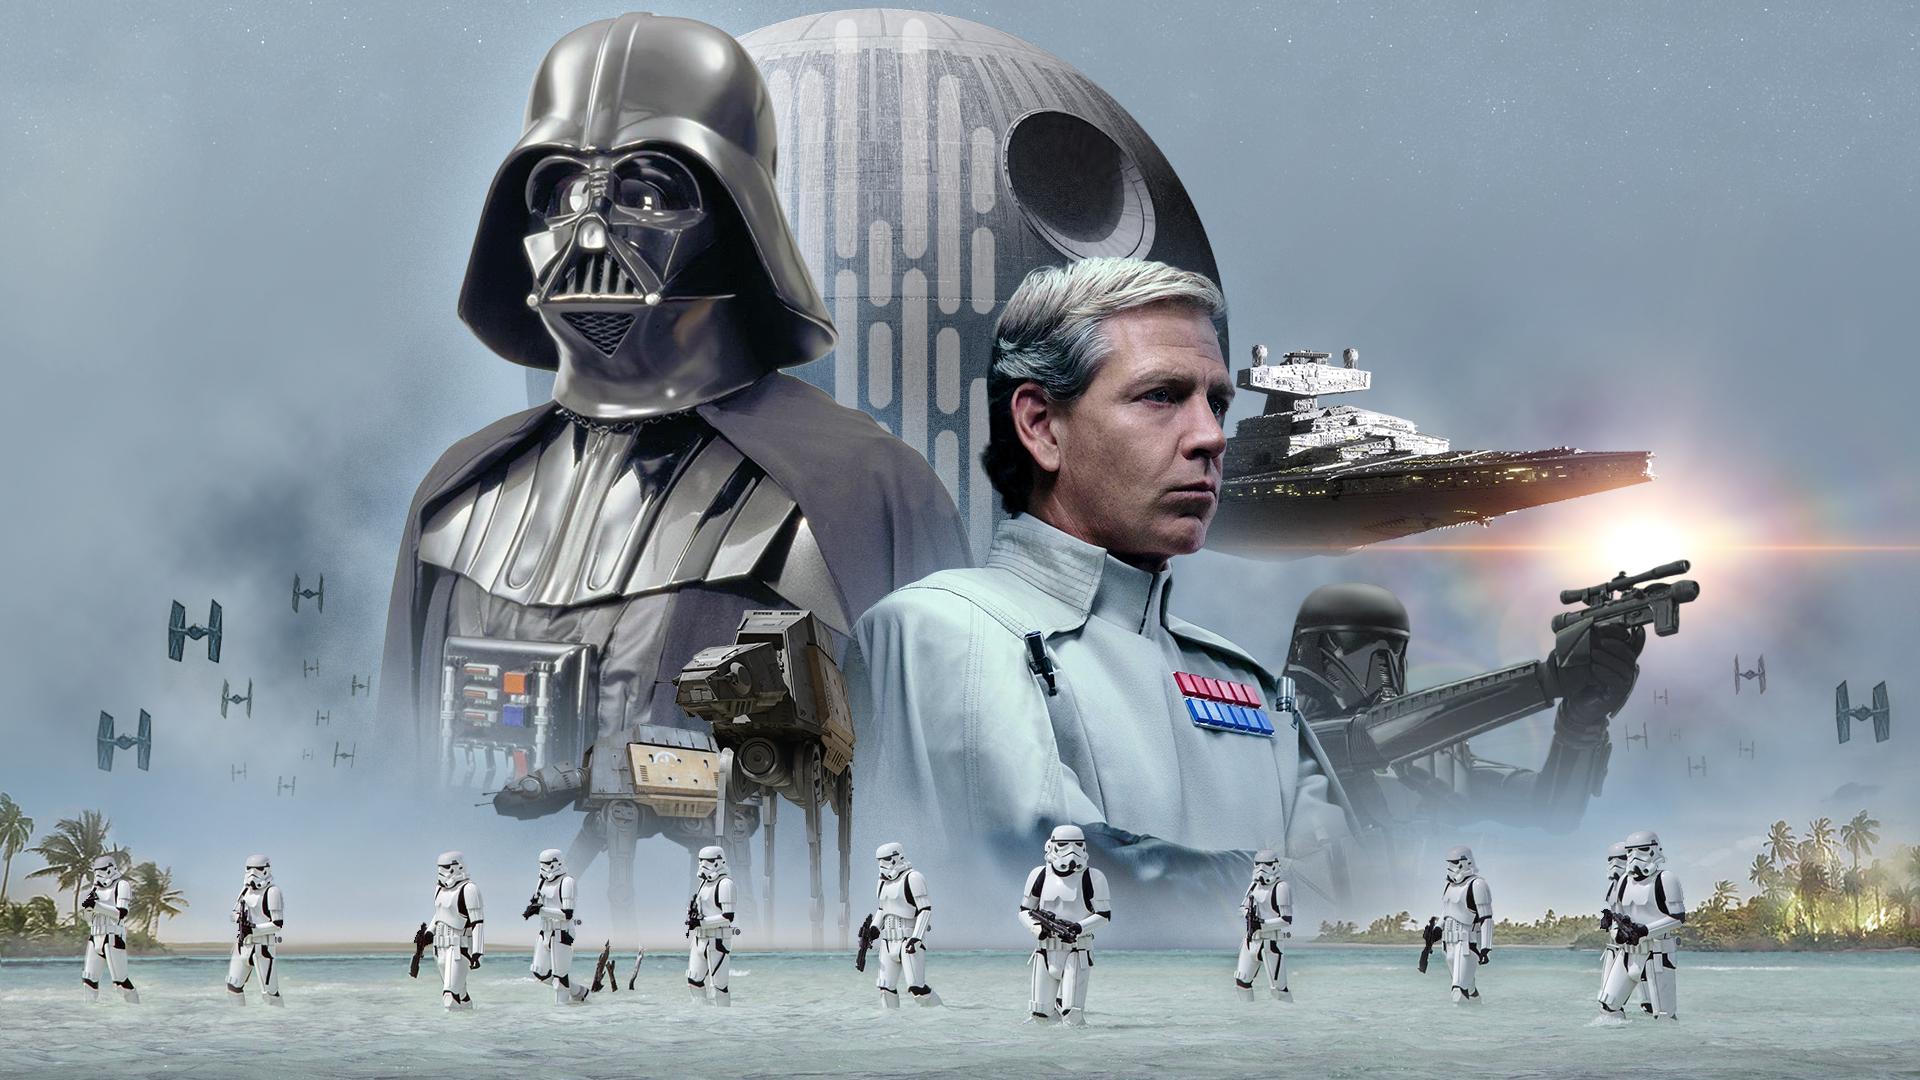 Star Wars Rogue One Wallpaper Hd - 1920x1080 Wallpaper ...